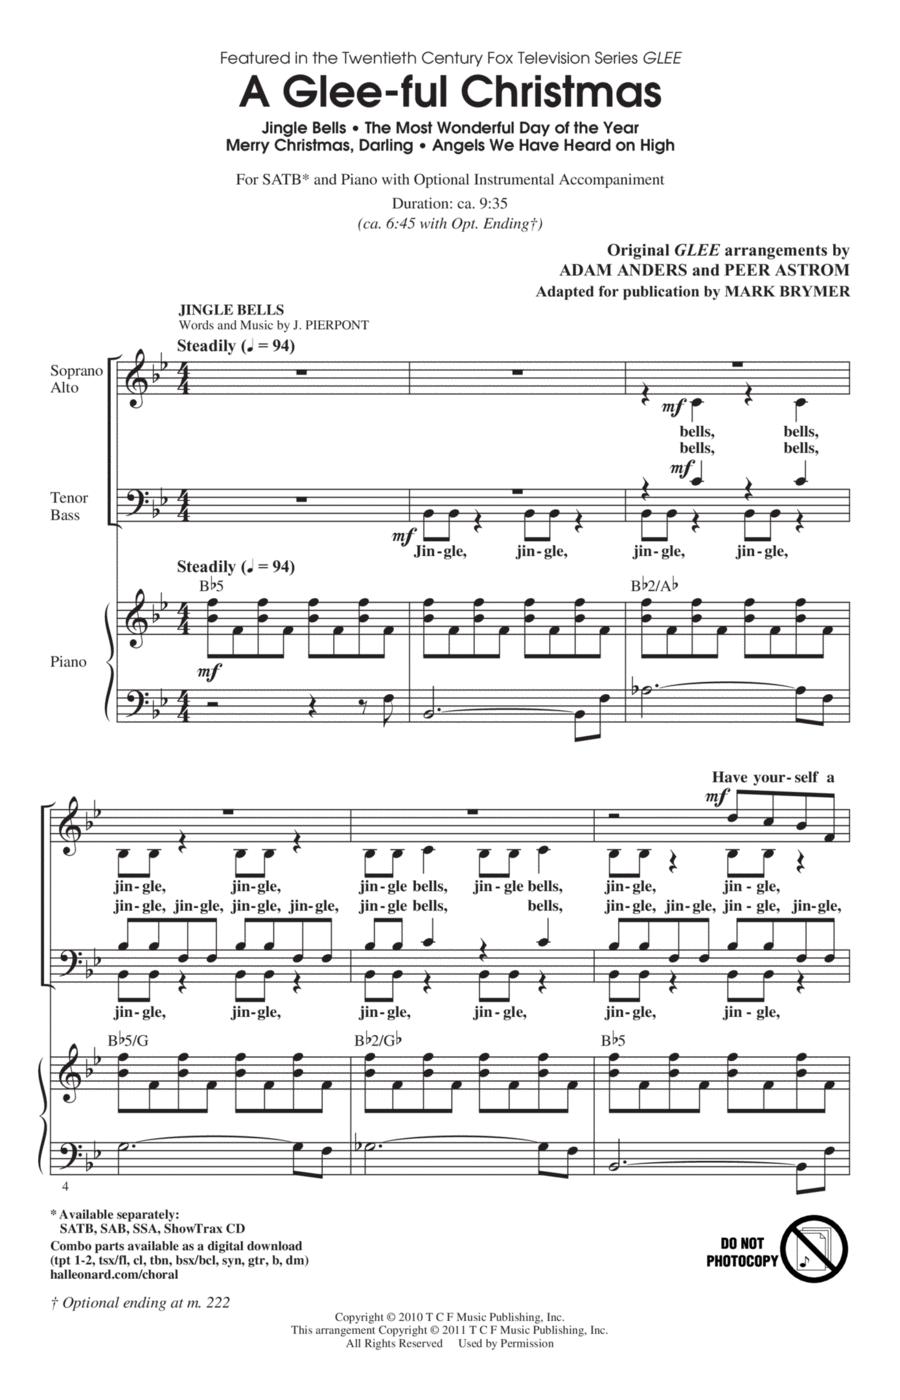 A Glee-ful Christmas (Choral Medley)